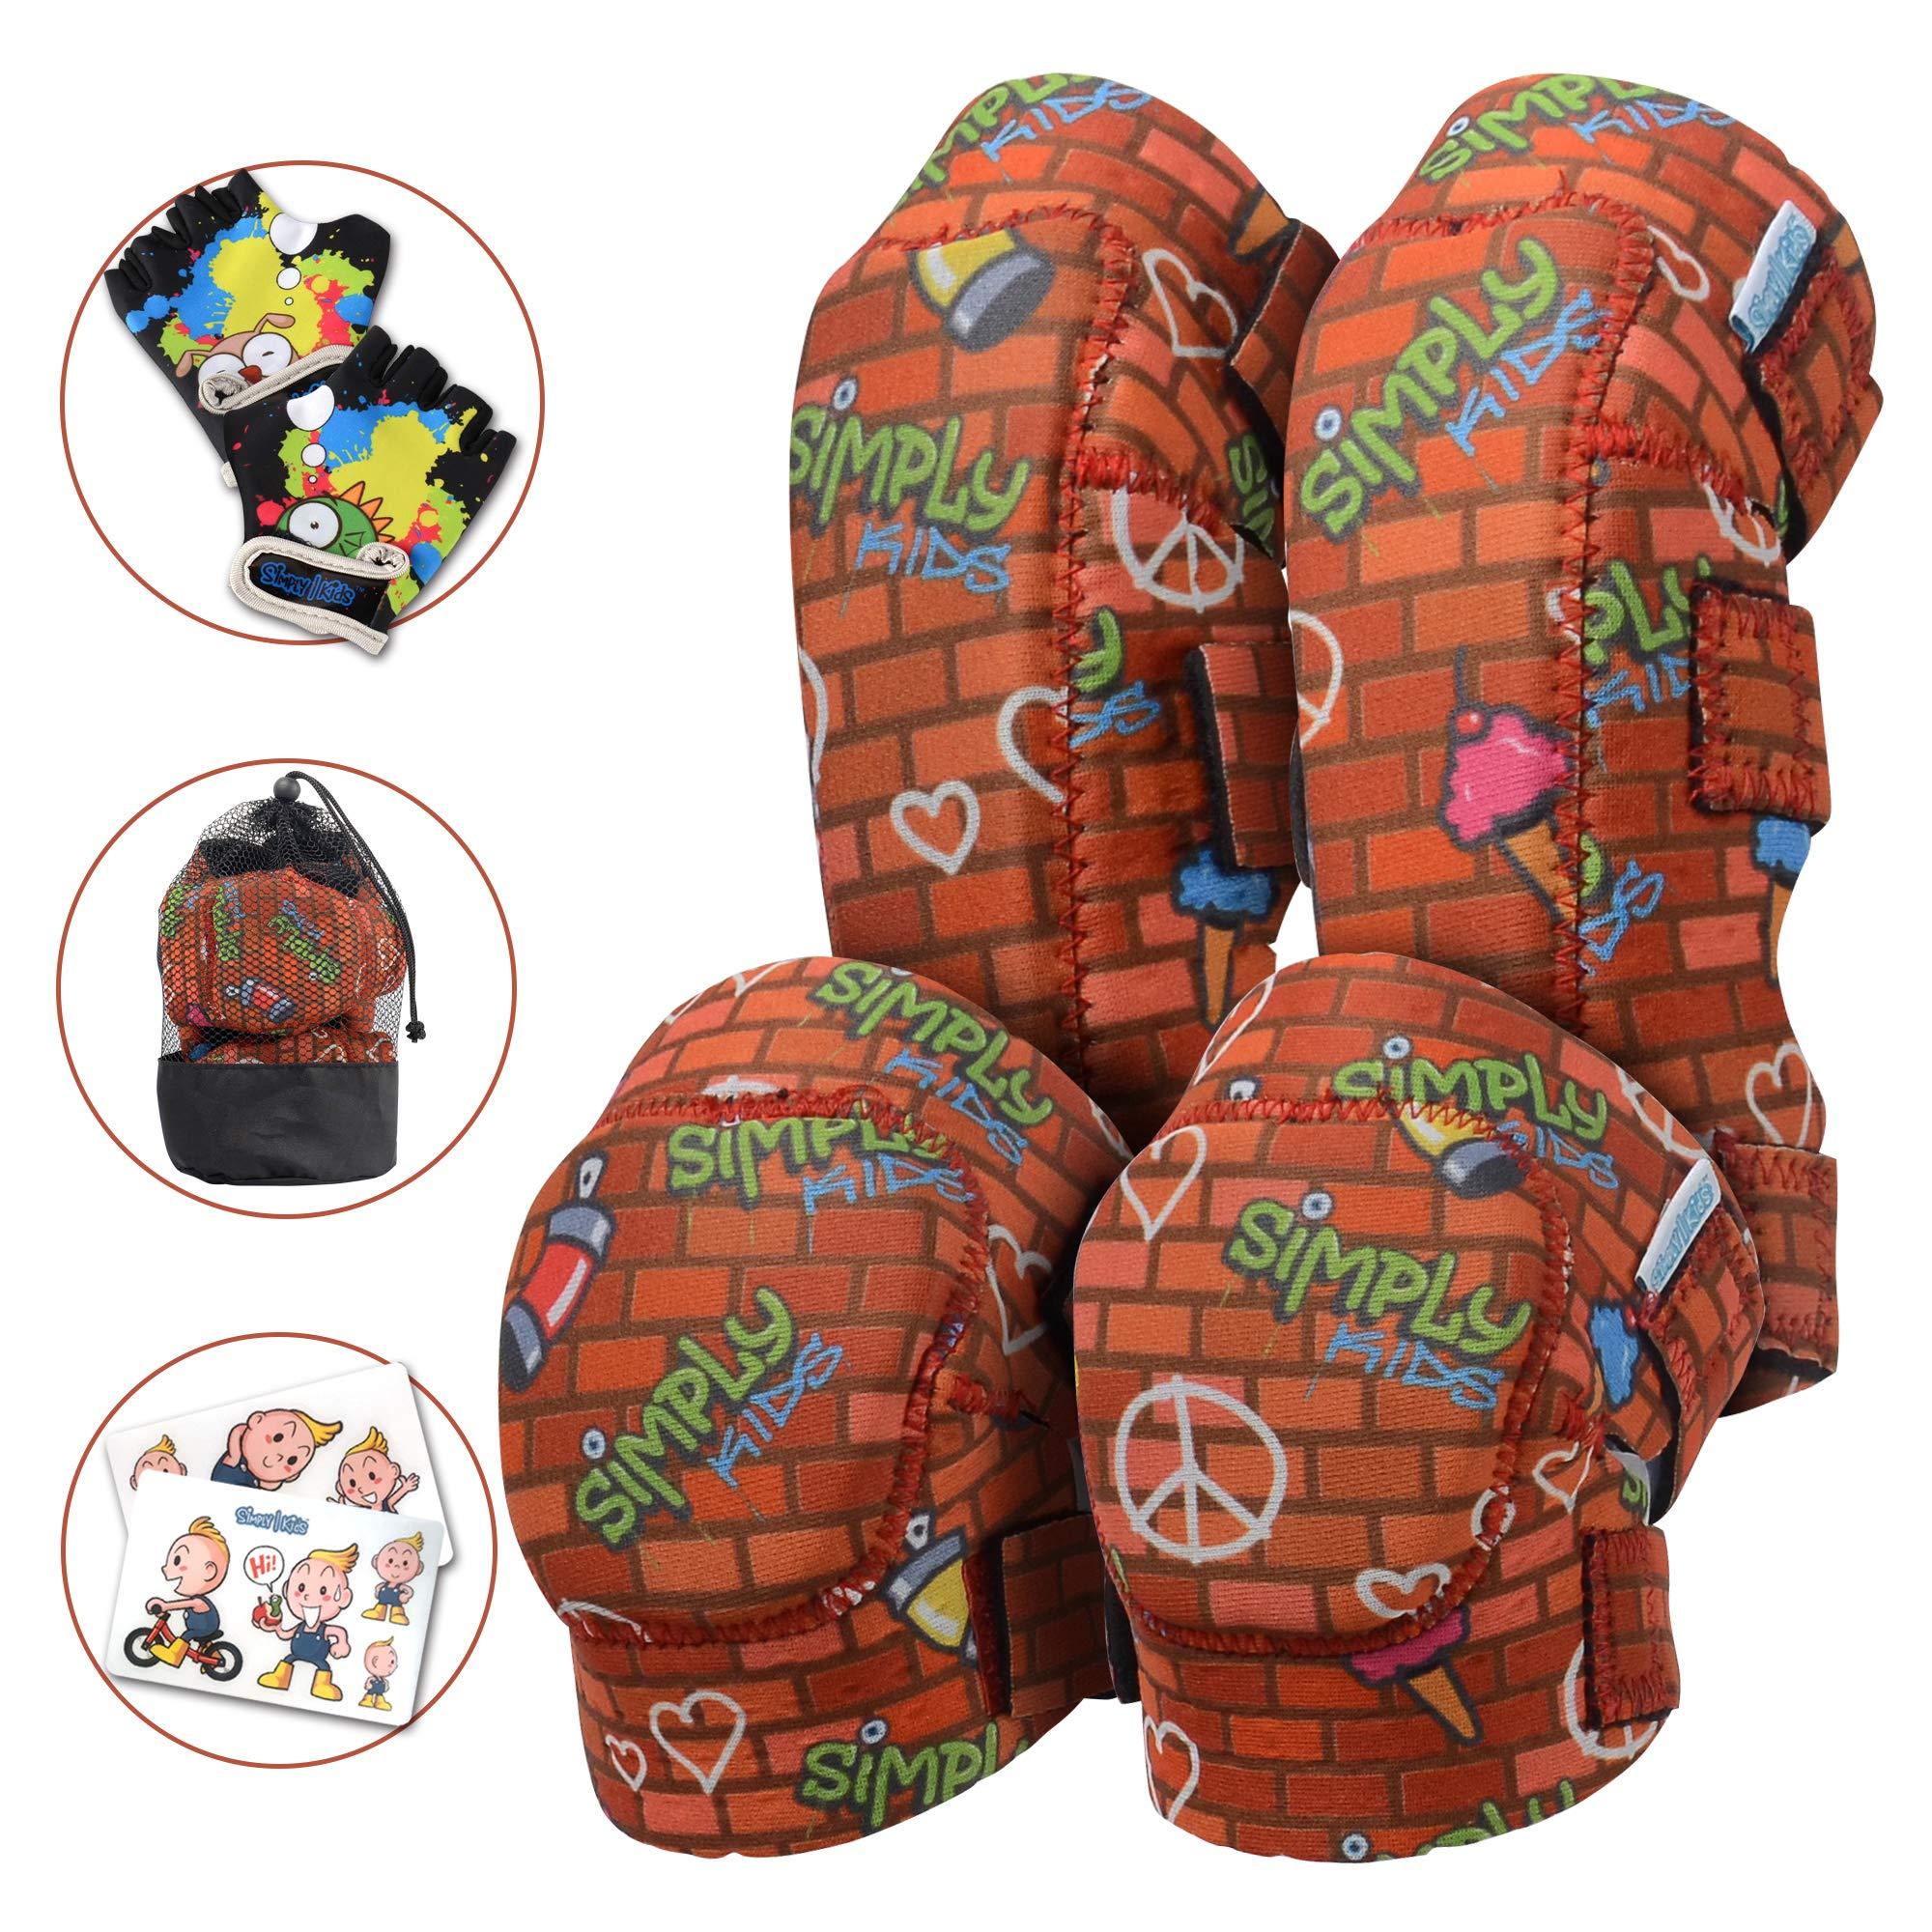 Innovative Soft Kids Knee and Elbow Pads with Bike Gloves | Toddler Protective Gear Set w/Mesh Bag | Roller-Skating, Skateboard, Bike for Children Boys Girls (Graffiti Brick Wall, Medium (4-8 Years))